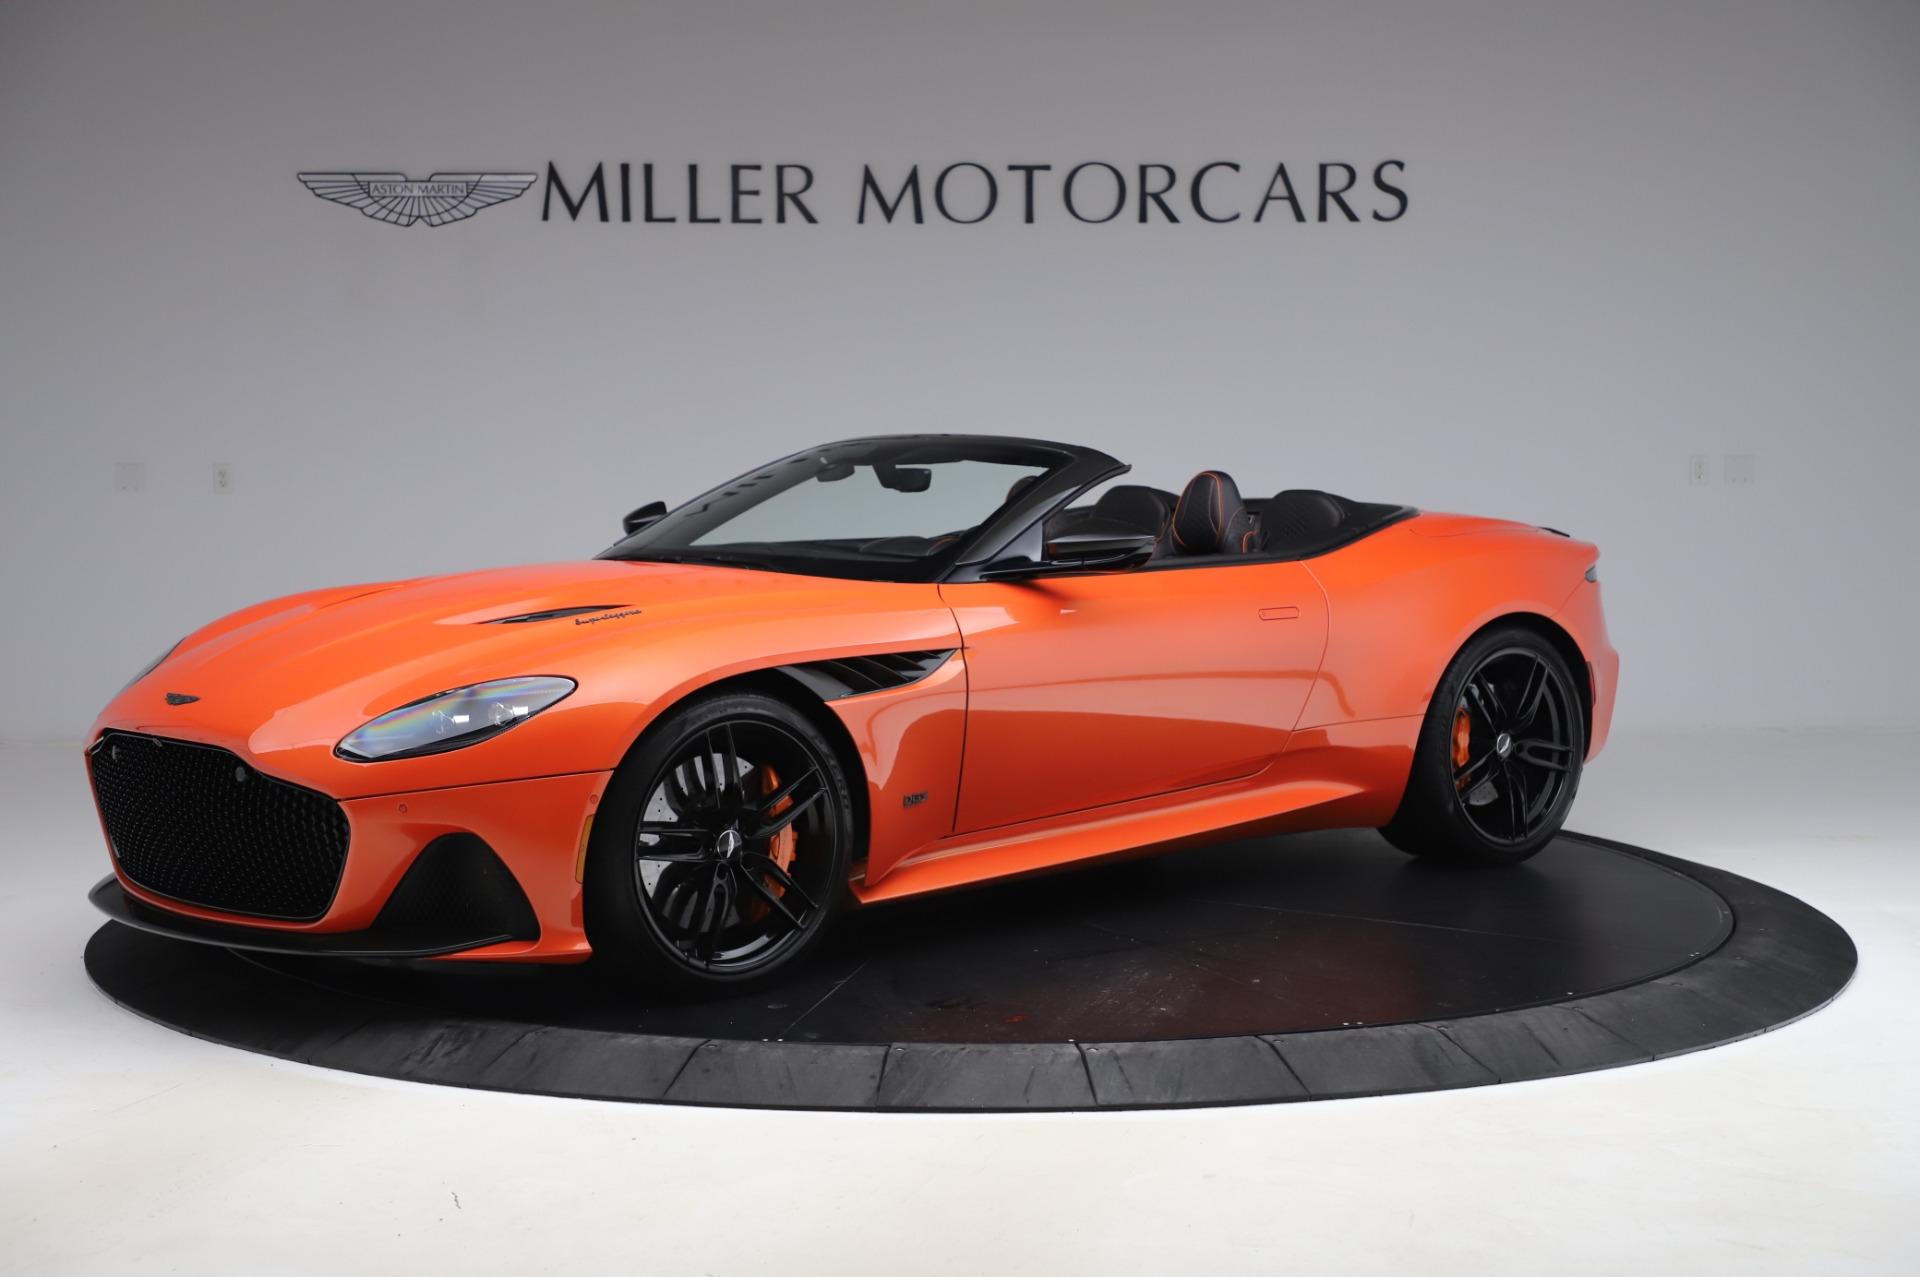 Used 2020 Aston Martin DBS Superleggera Volante for sale Sold at Bentley Greenwich in Greenwich CT 06830 1